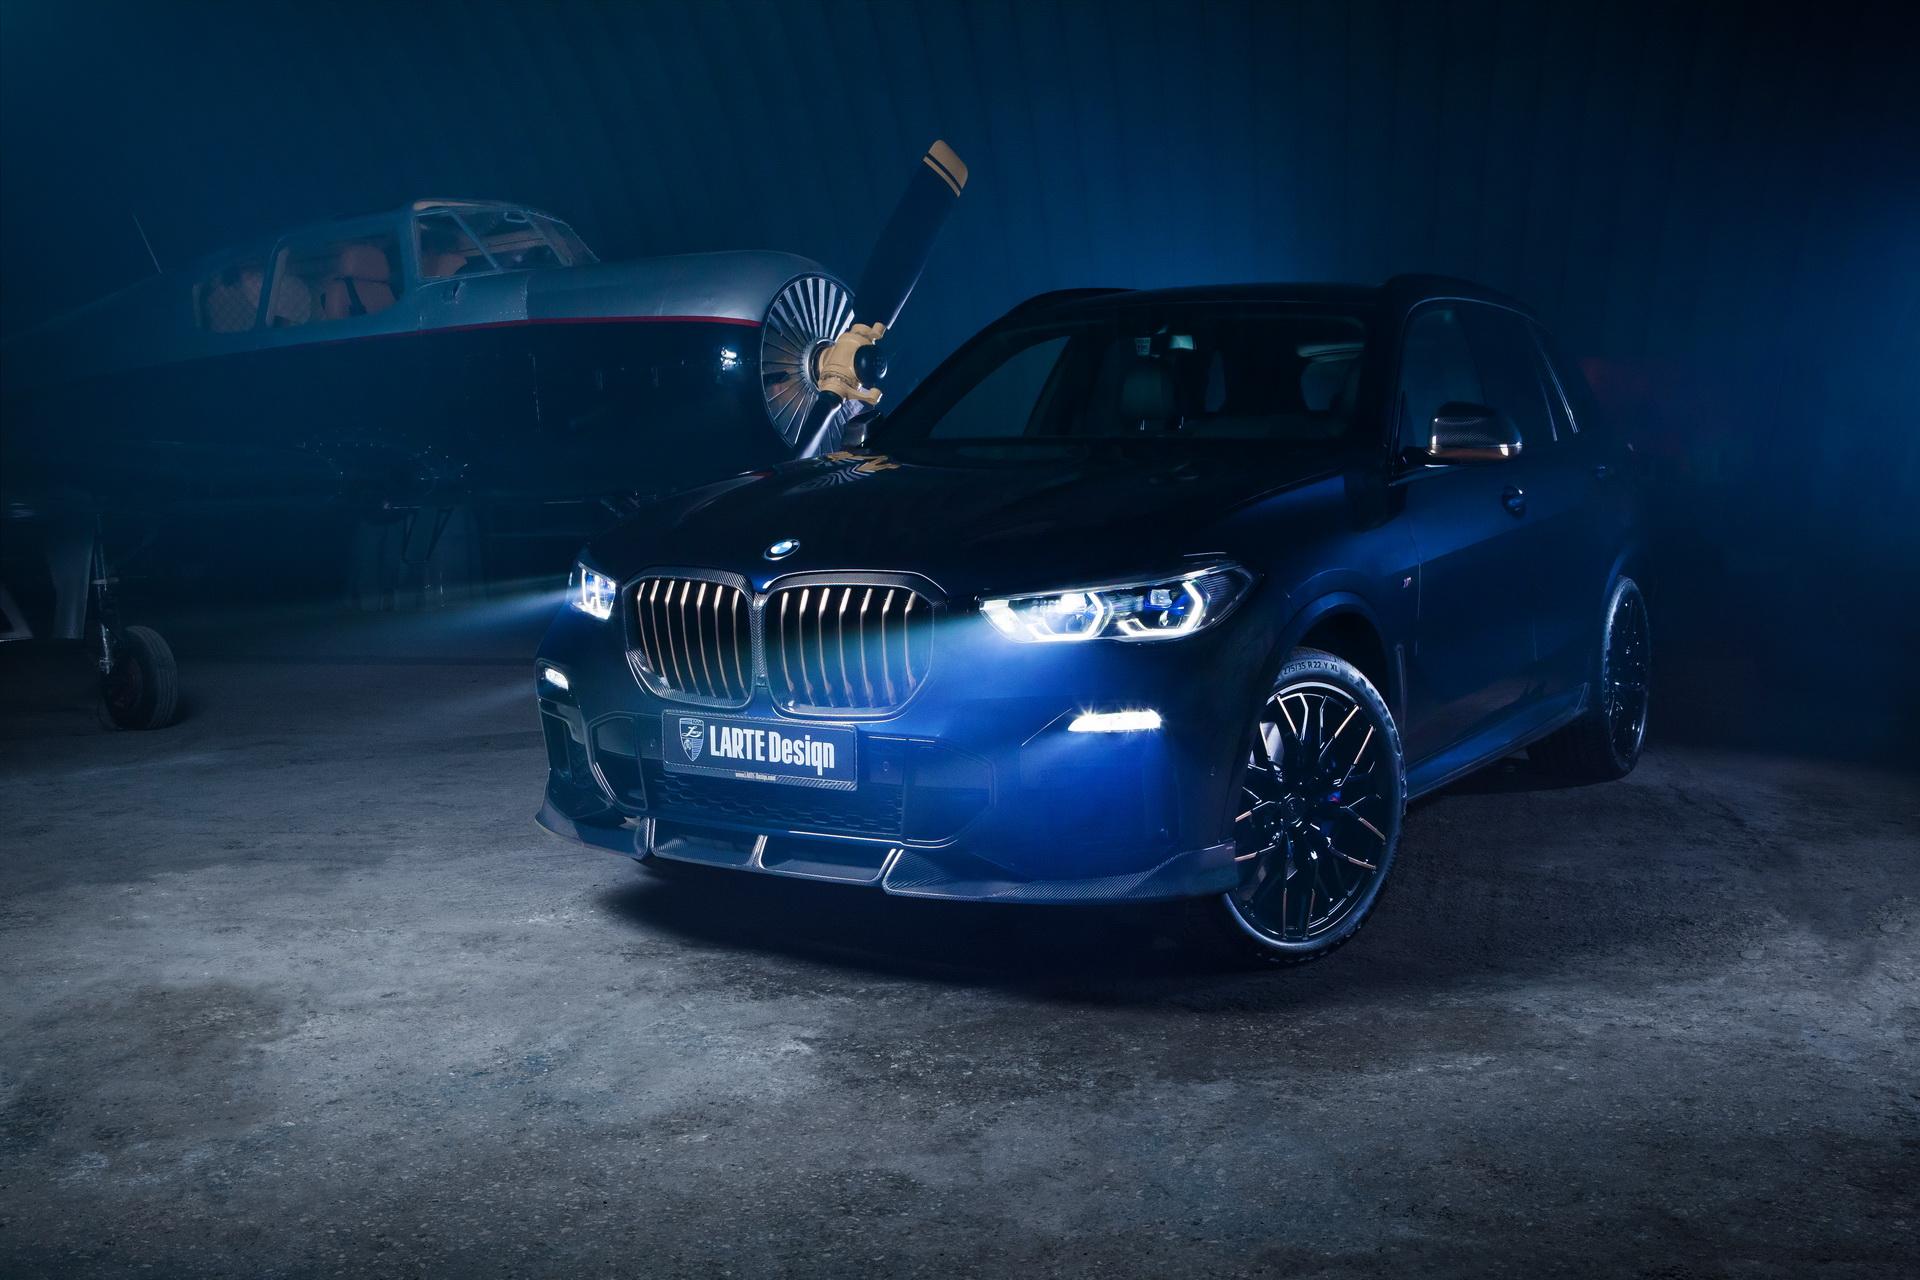 LARTE Design BMW X5 16